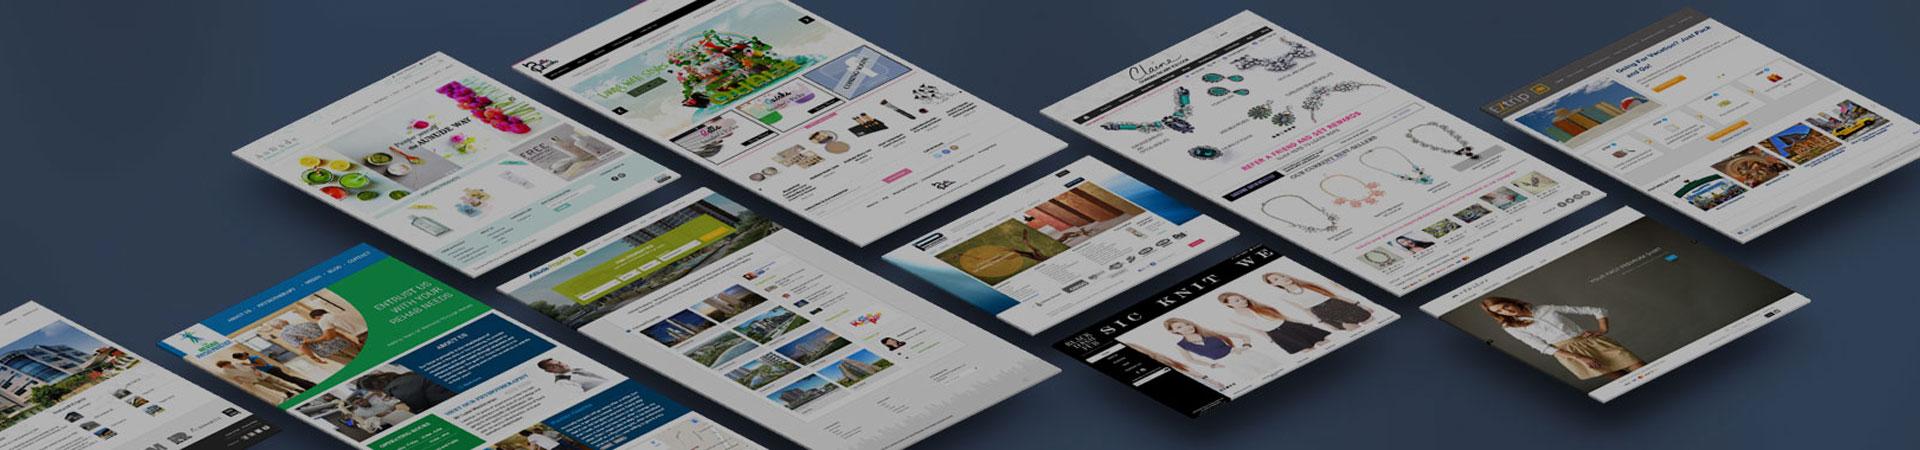 Website Design Singapore - Performance Coatings